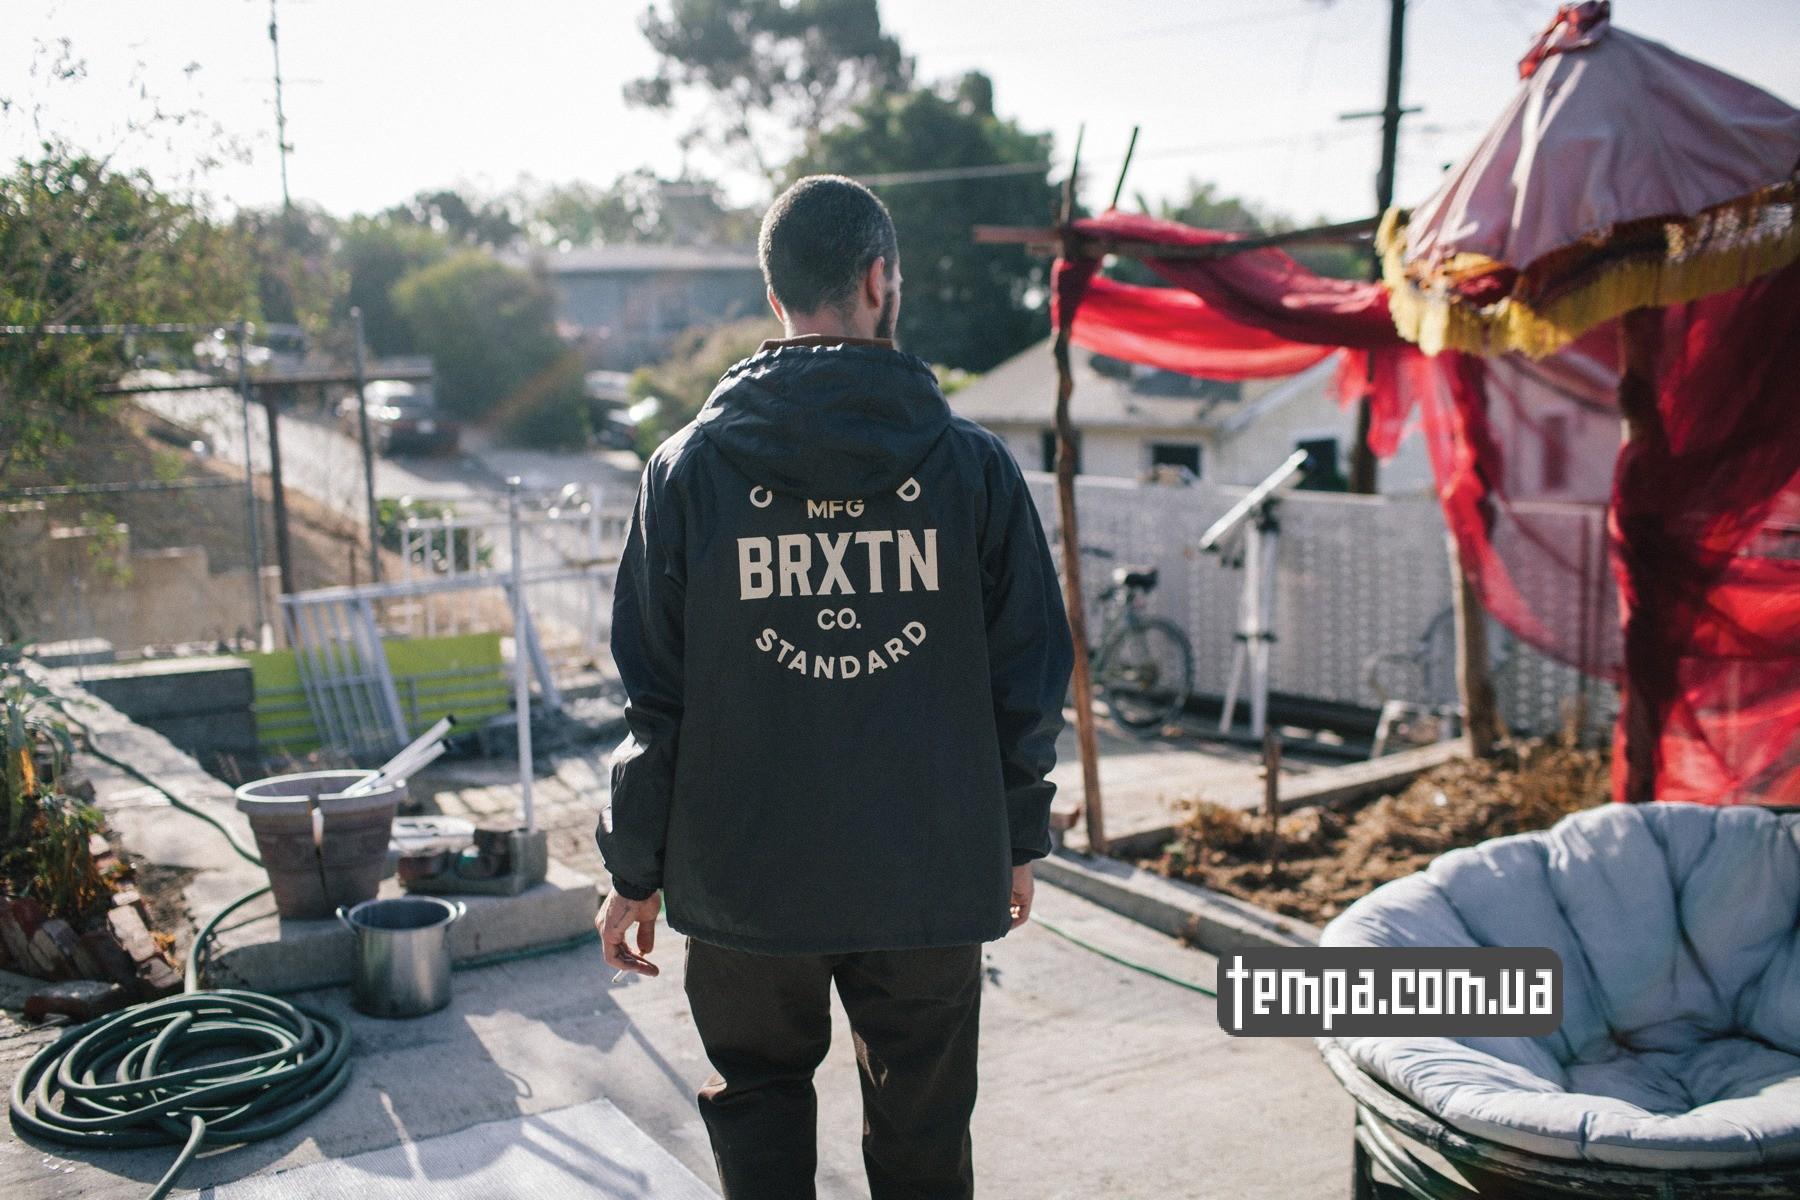 brixton одежда украина заказать